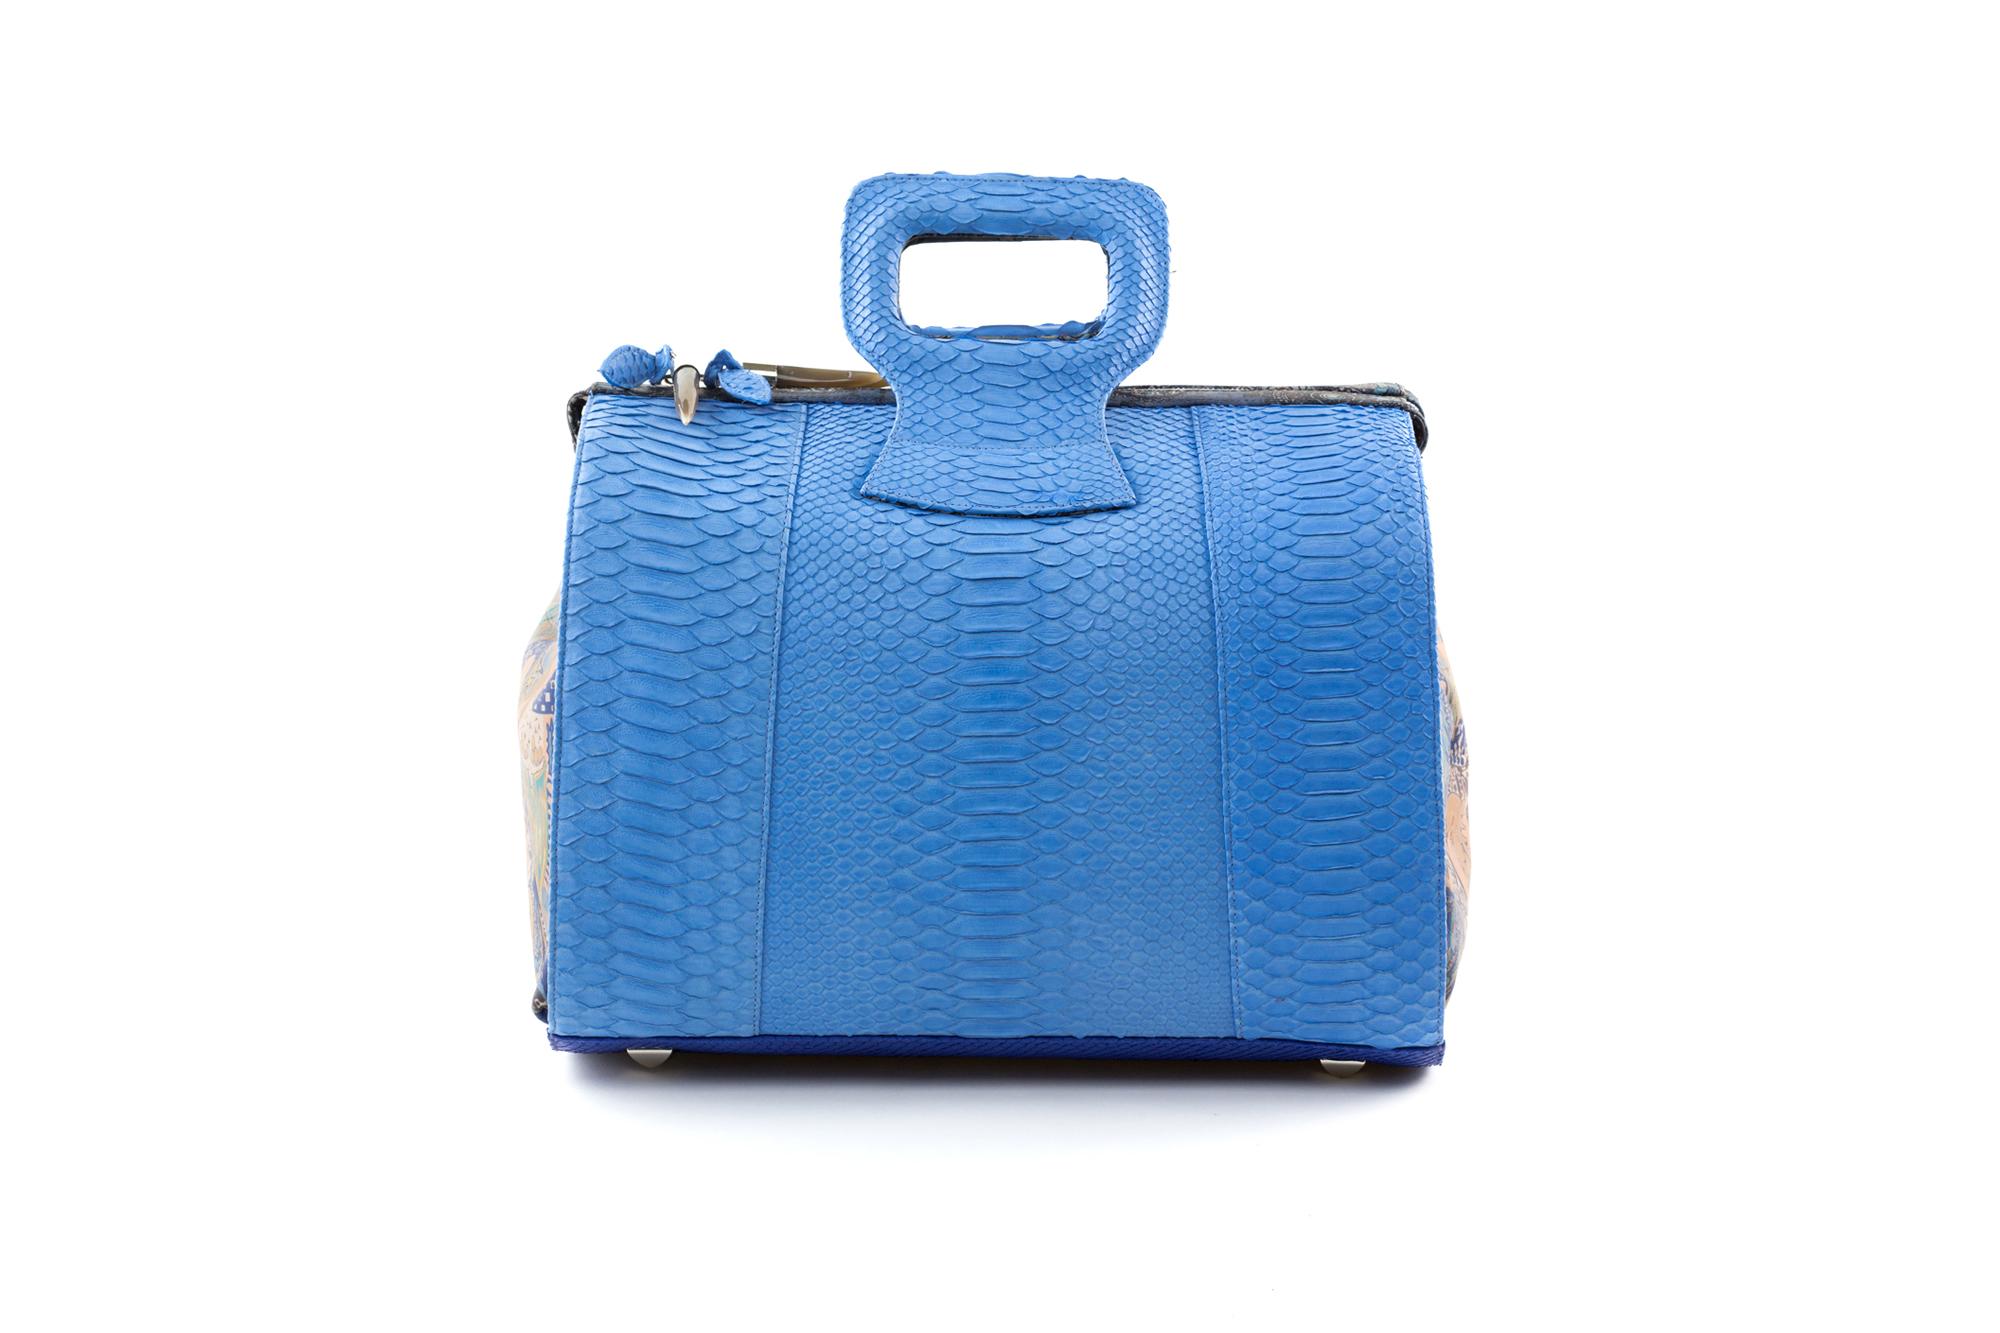 15 inch handbag duffel blue python miracles 2